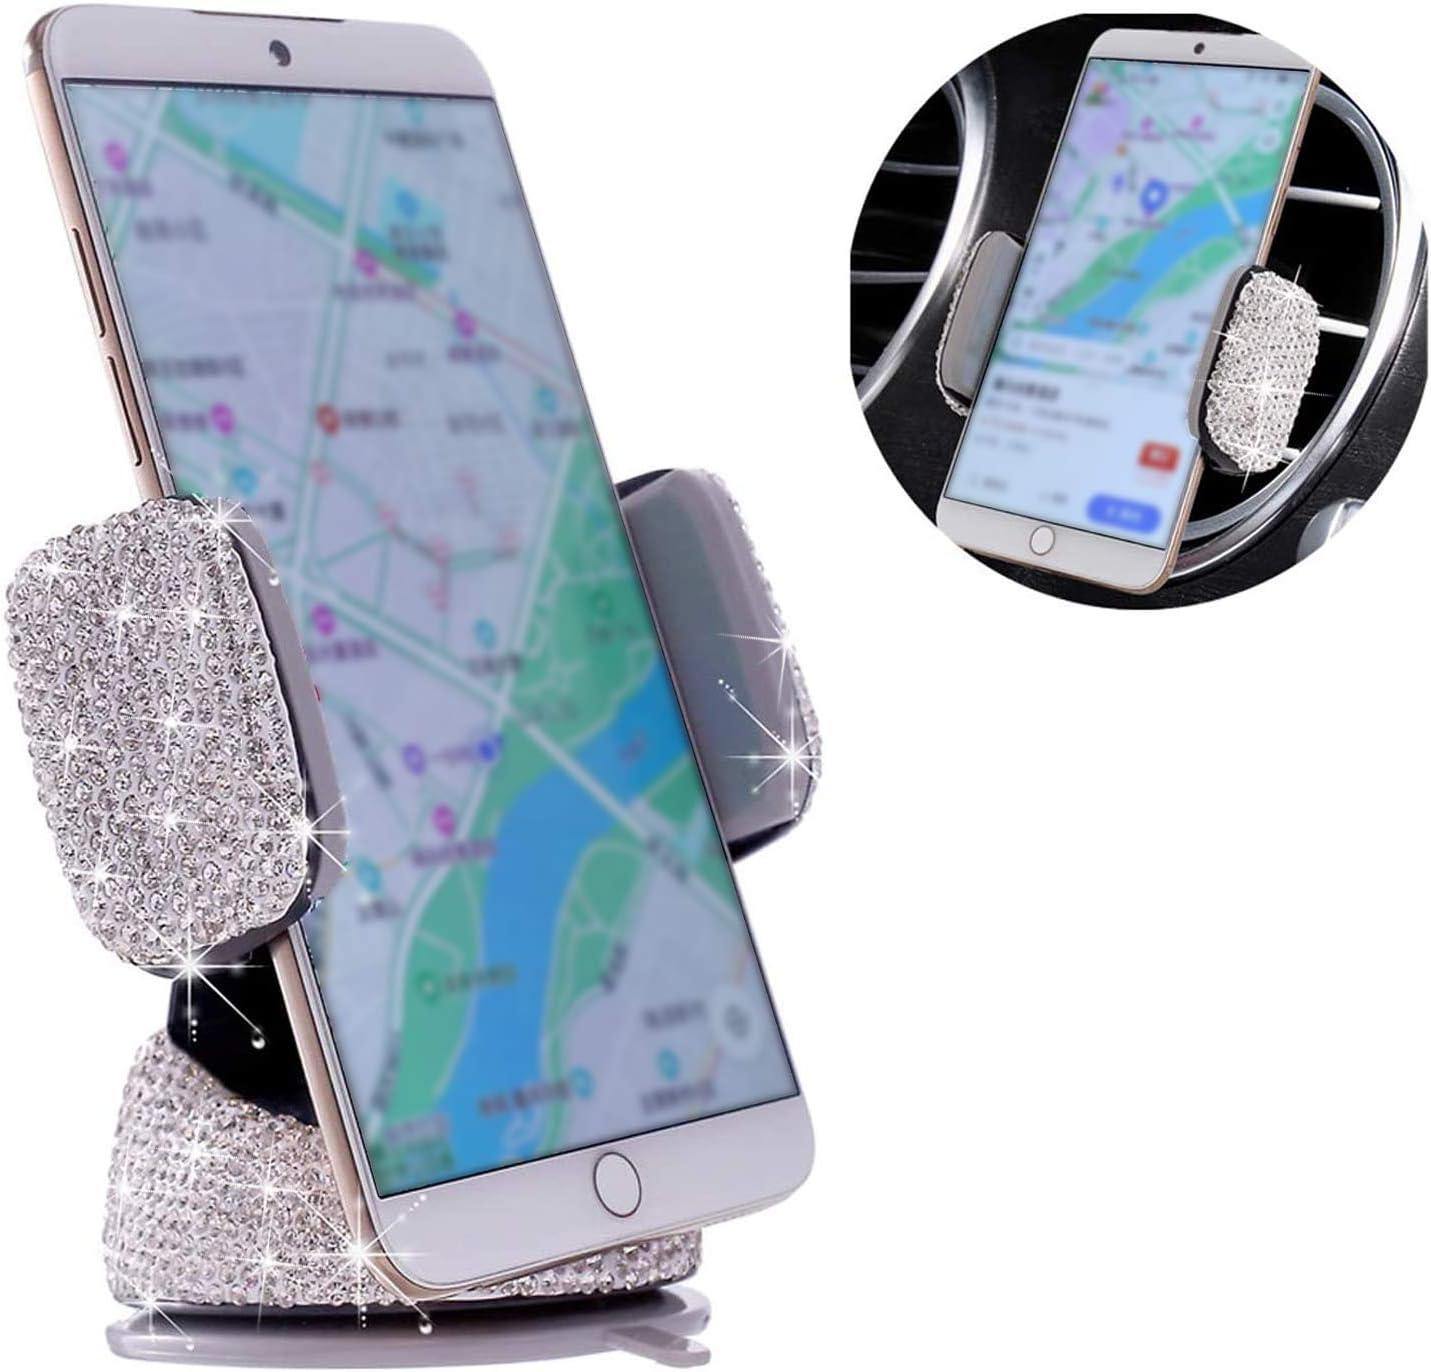 Bling Crystal Virginia Beach Mall Car Product Phone Mount,Car U Adjustable Holder